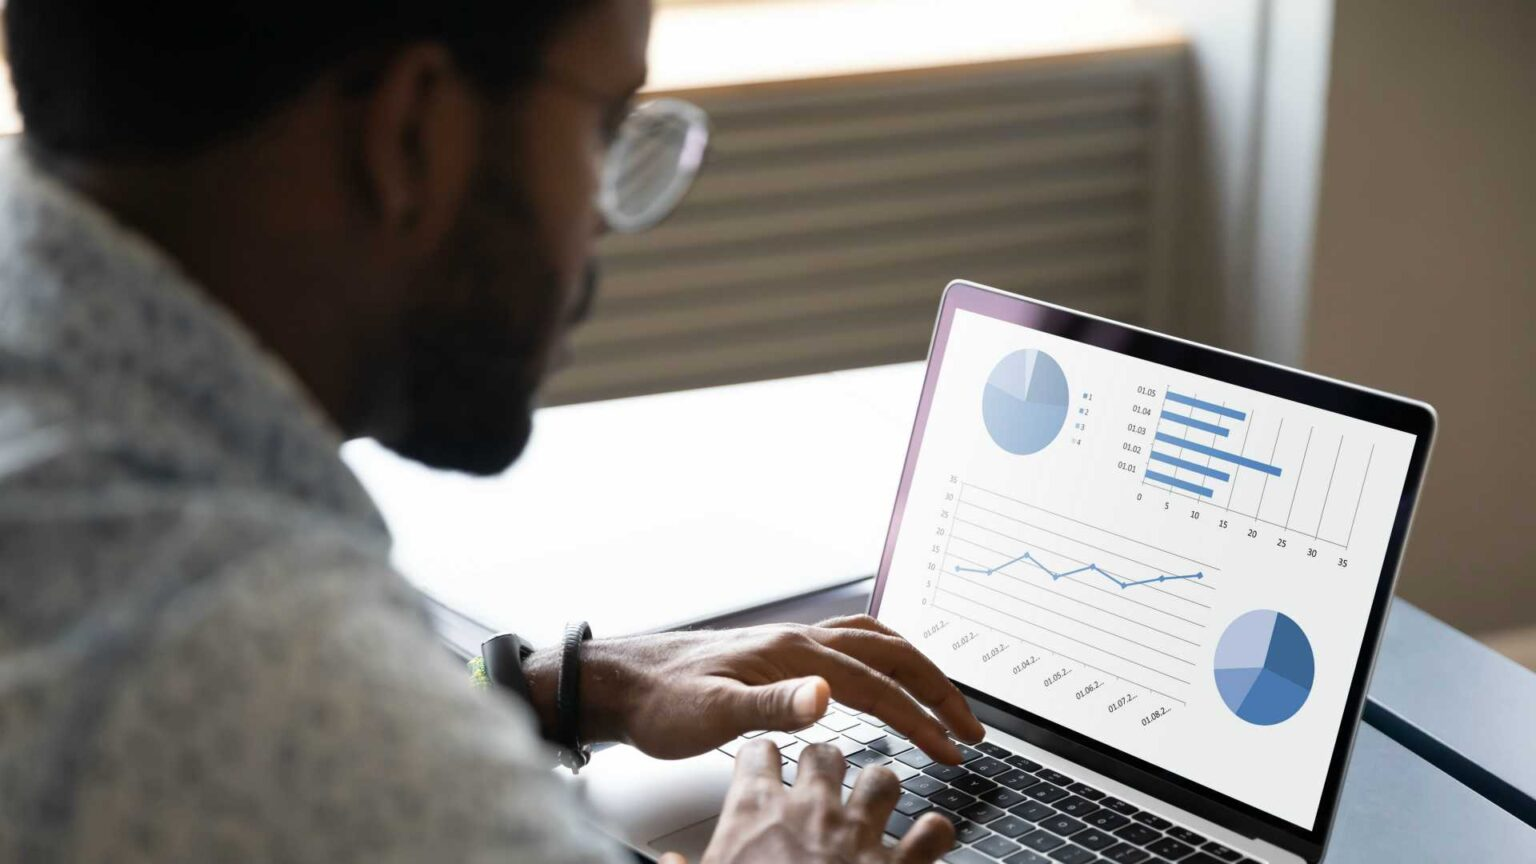 How to Use Employee Training Metrics to Measure Training Effectiveness and Impact